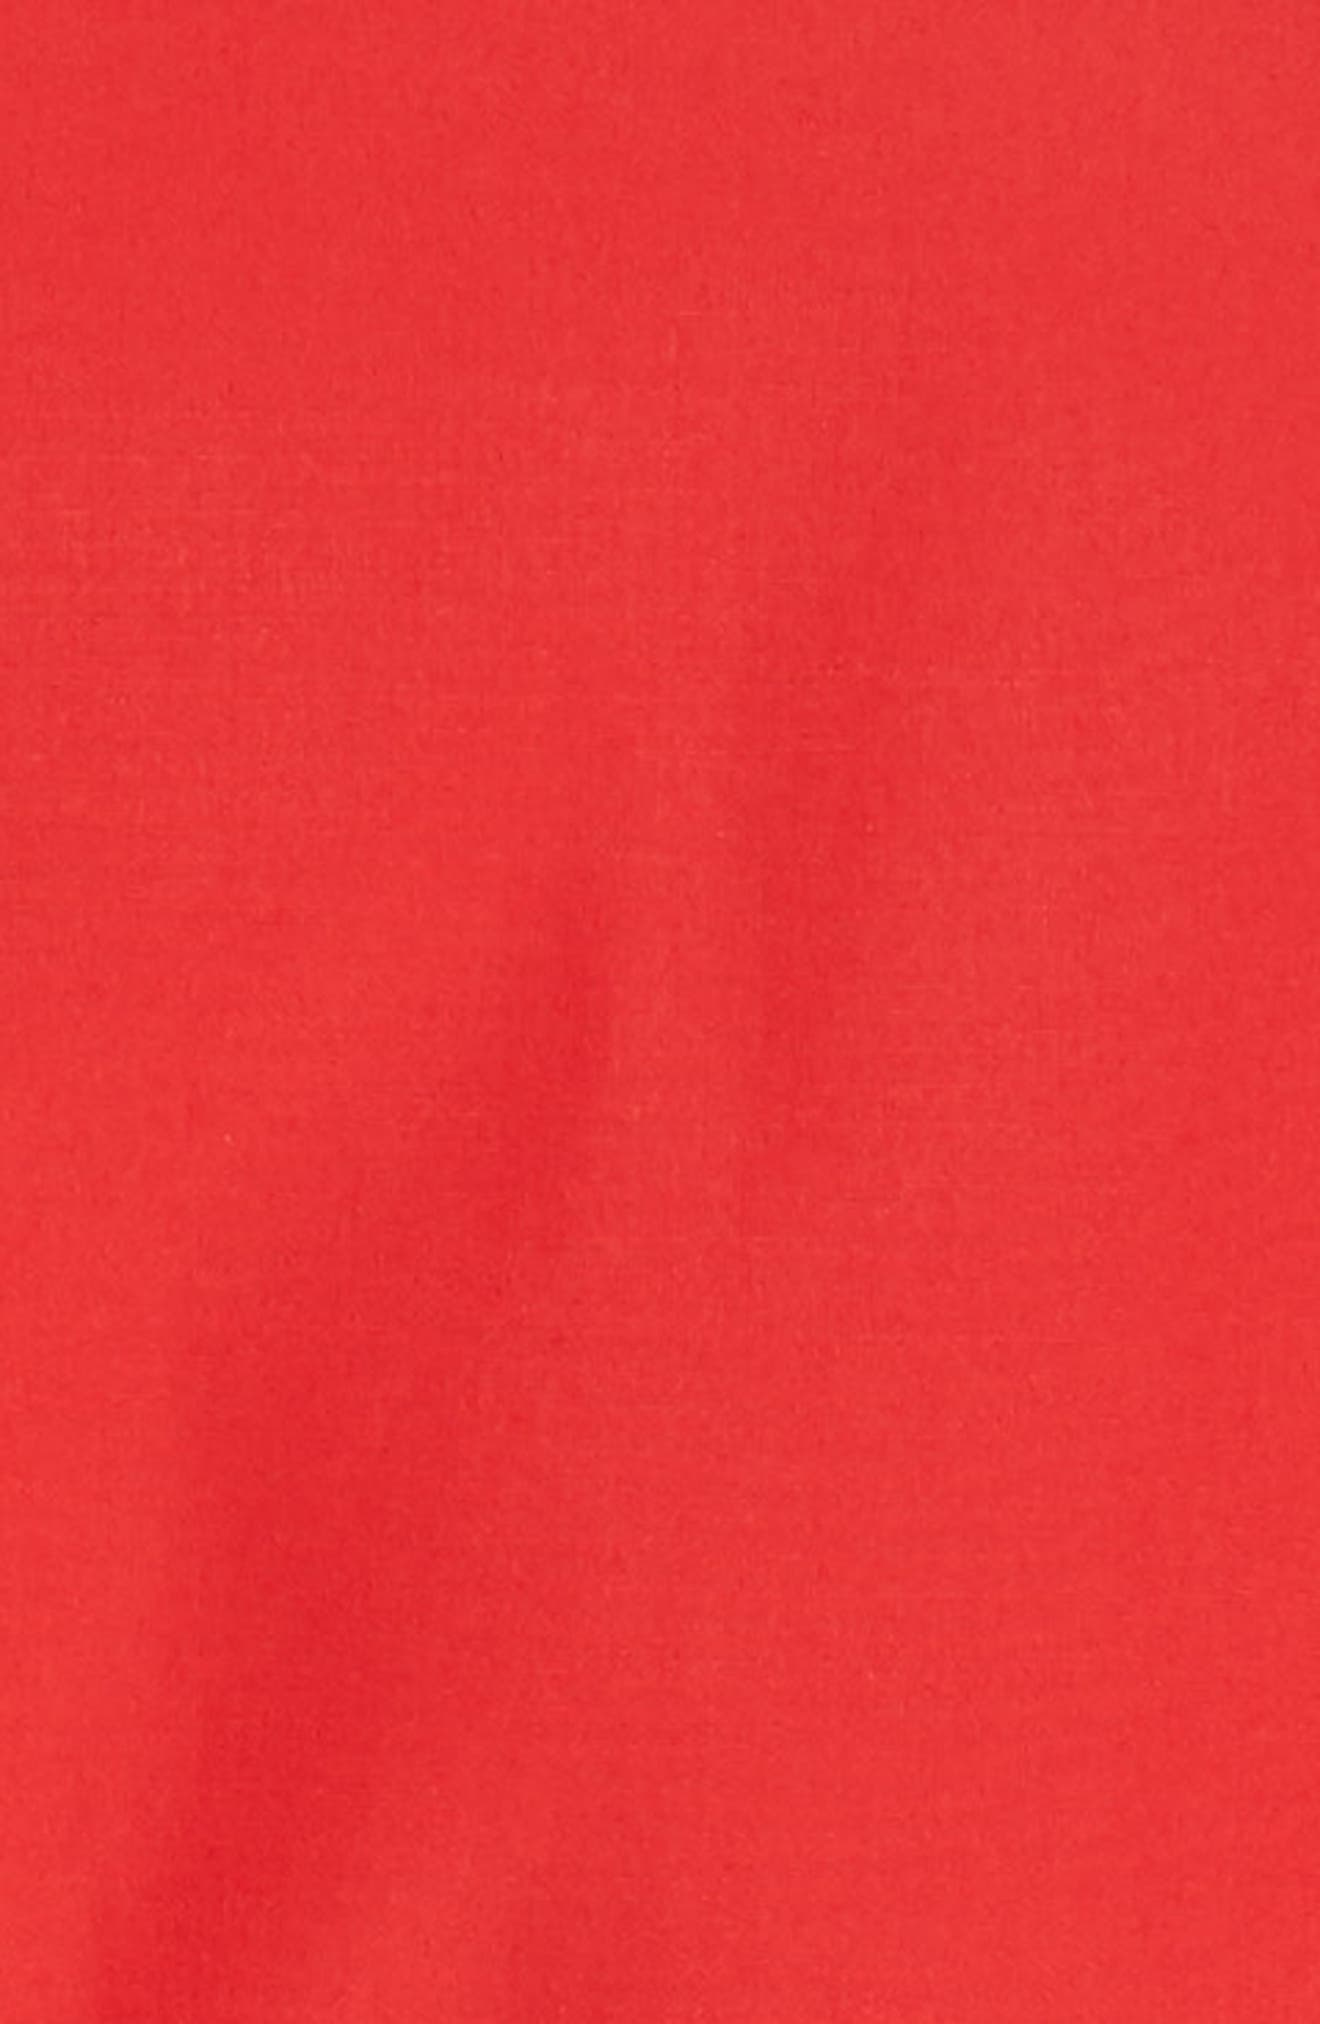 Dalmine Cotton Wrap Dress,                             Alternate thumbnail 5, color,                             RED